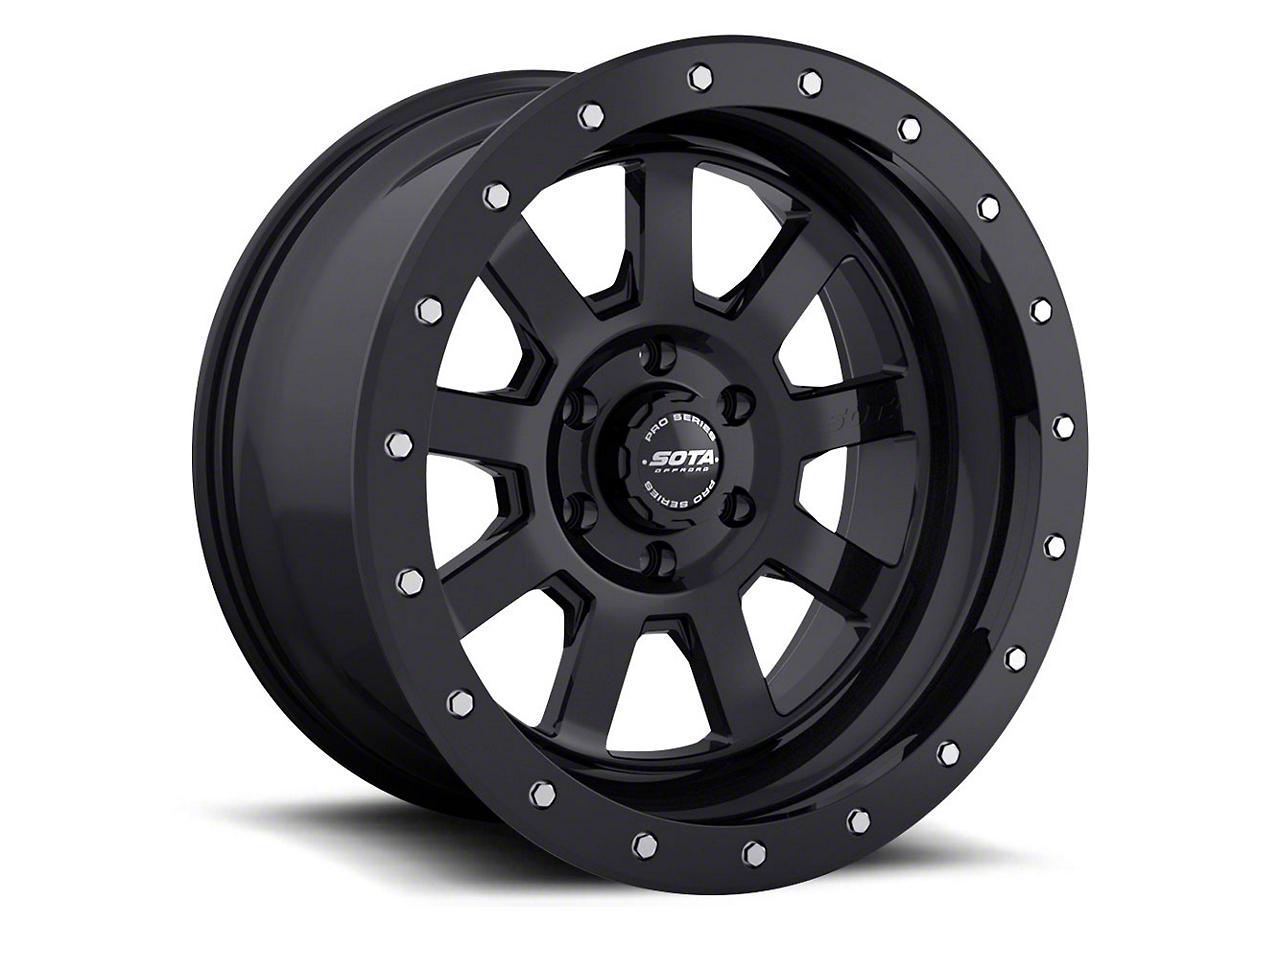 SOTA Off Road S.S.D Stealth Black 8-Lug Wheel - 17x8.5 (06-08 RAM 1500 Mega Cab)